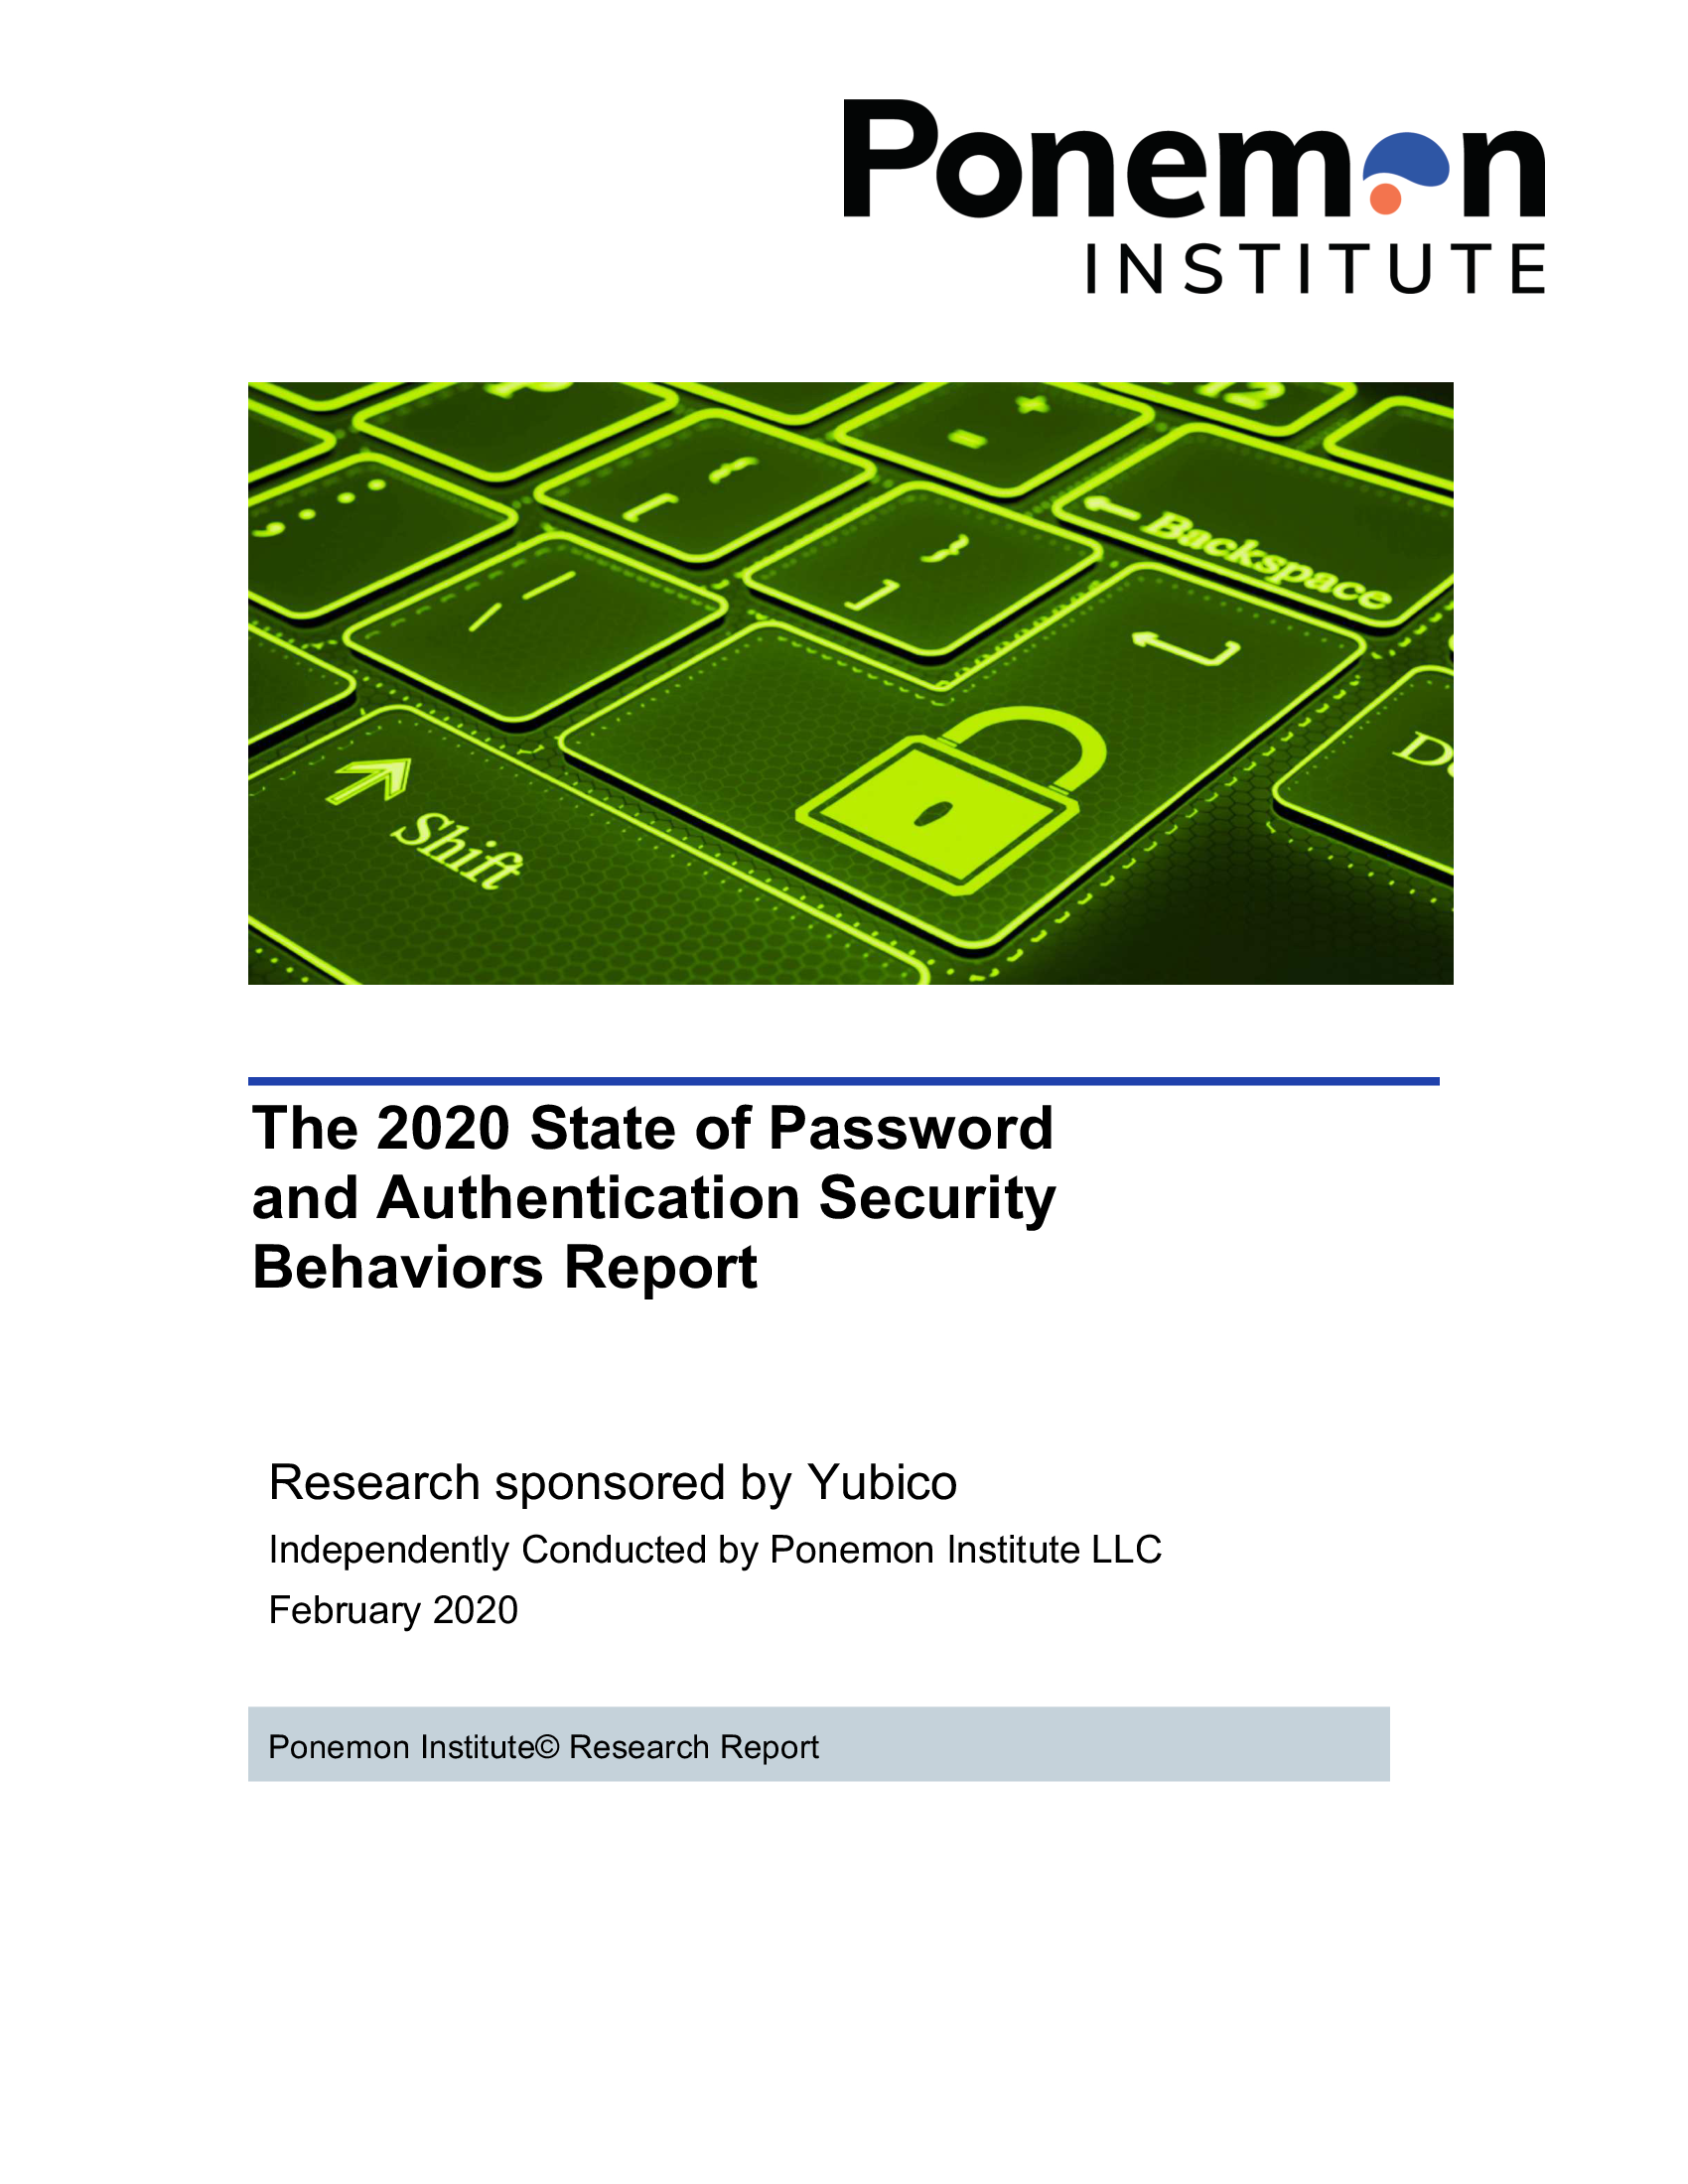 The 2020 Ponemon report - cover